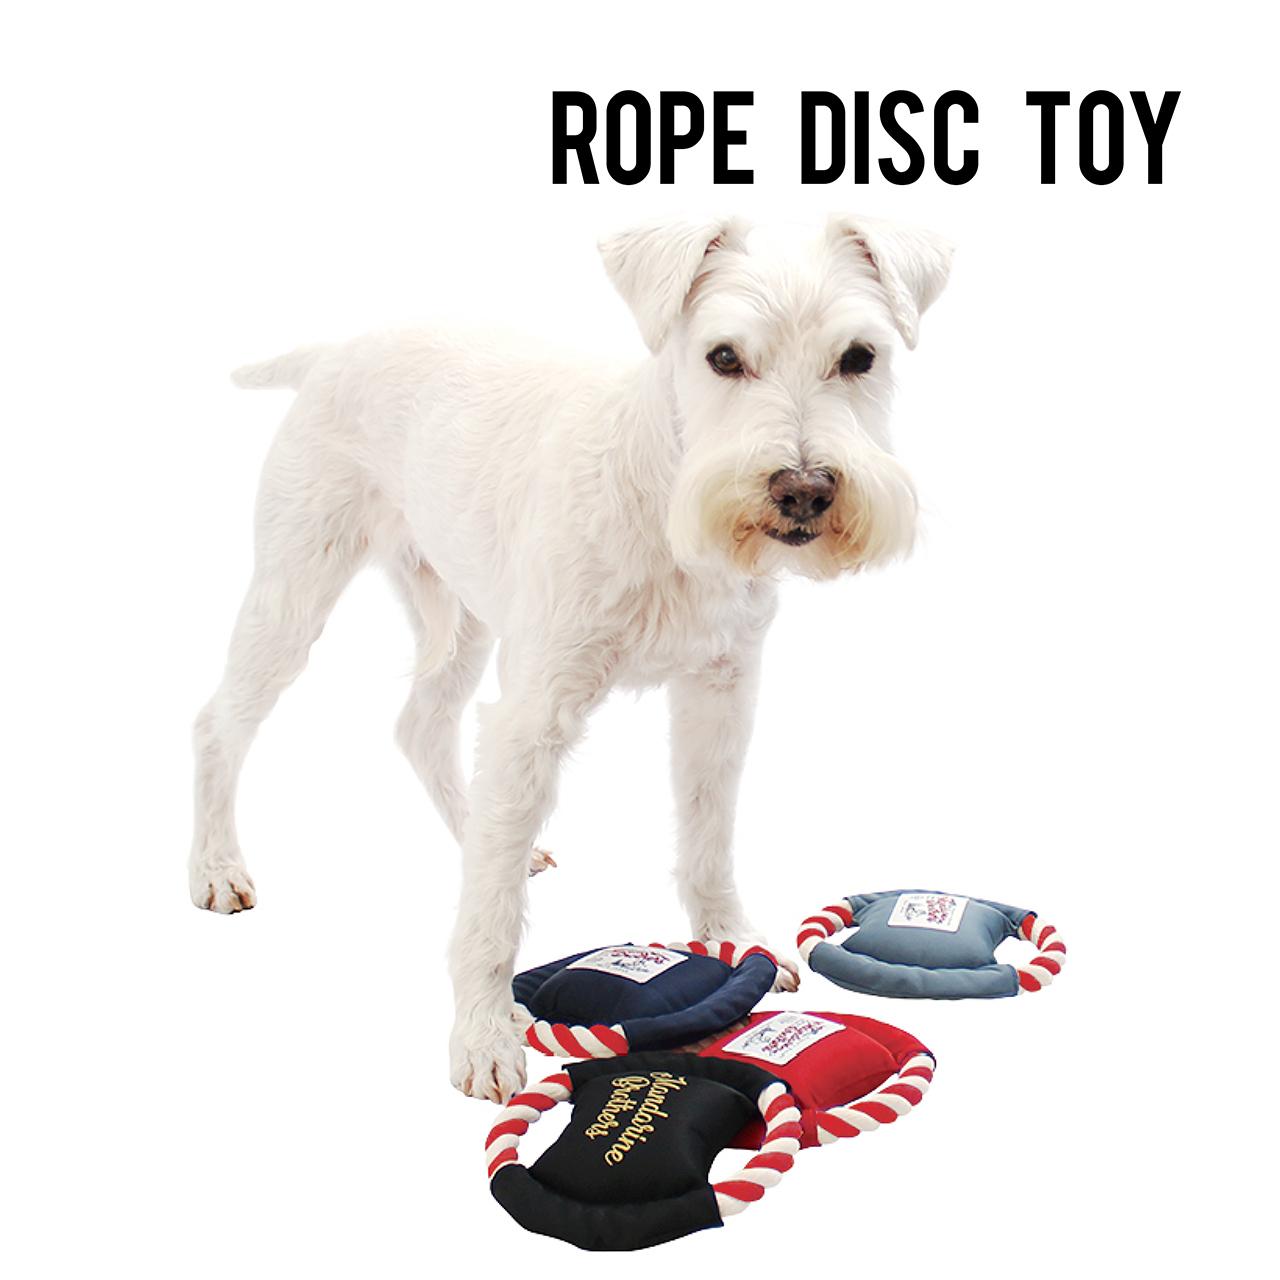 ROPE DISC TOY ロープディスクトイ